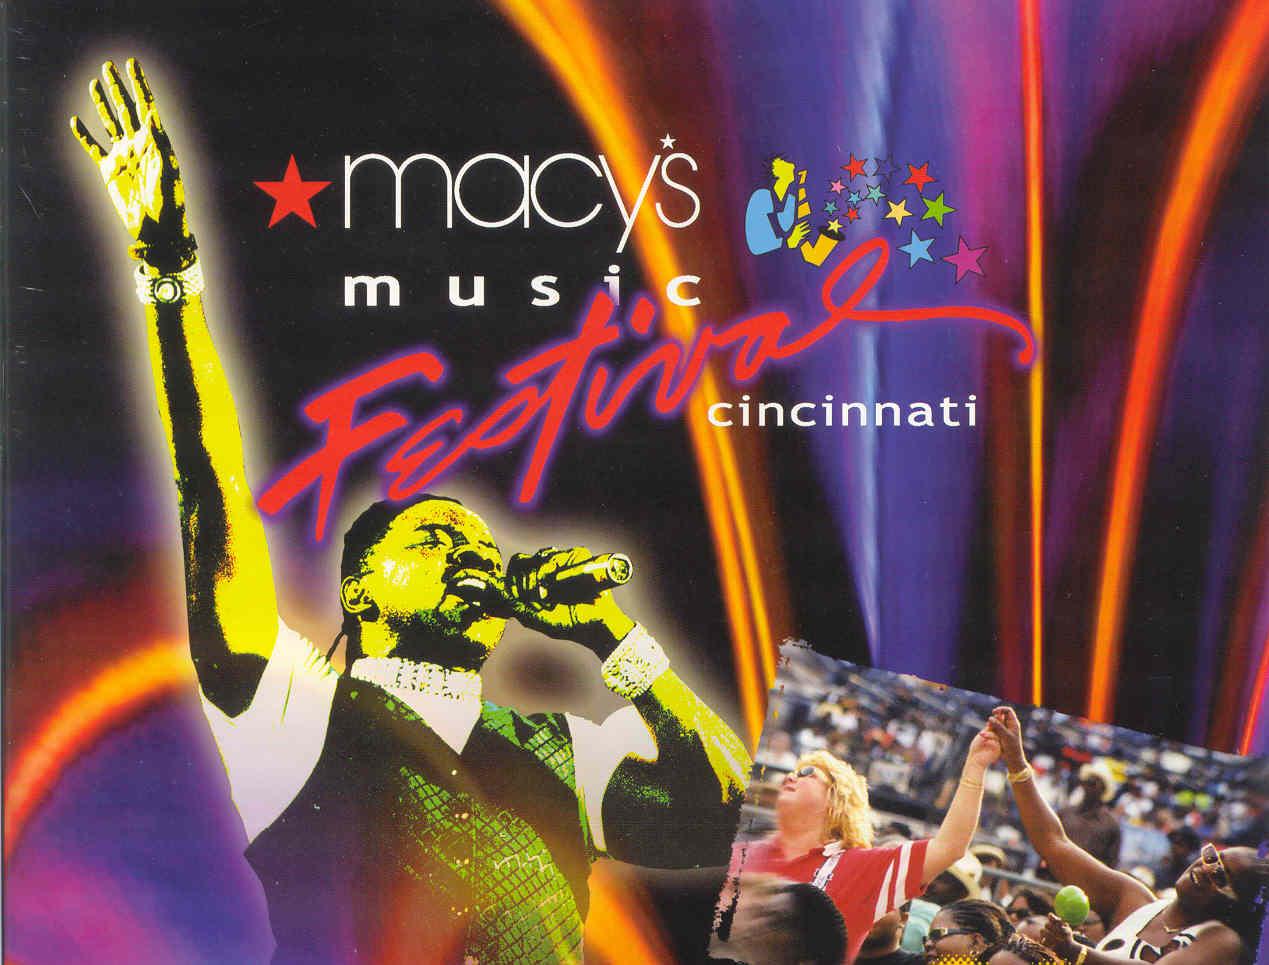 Macy's Insite